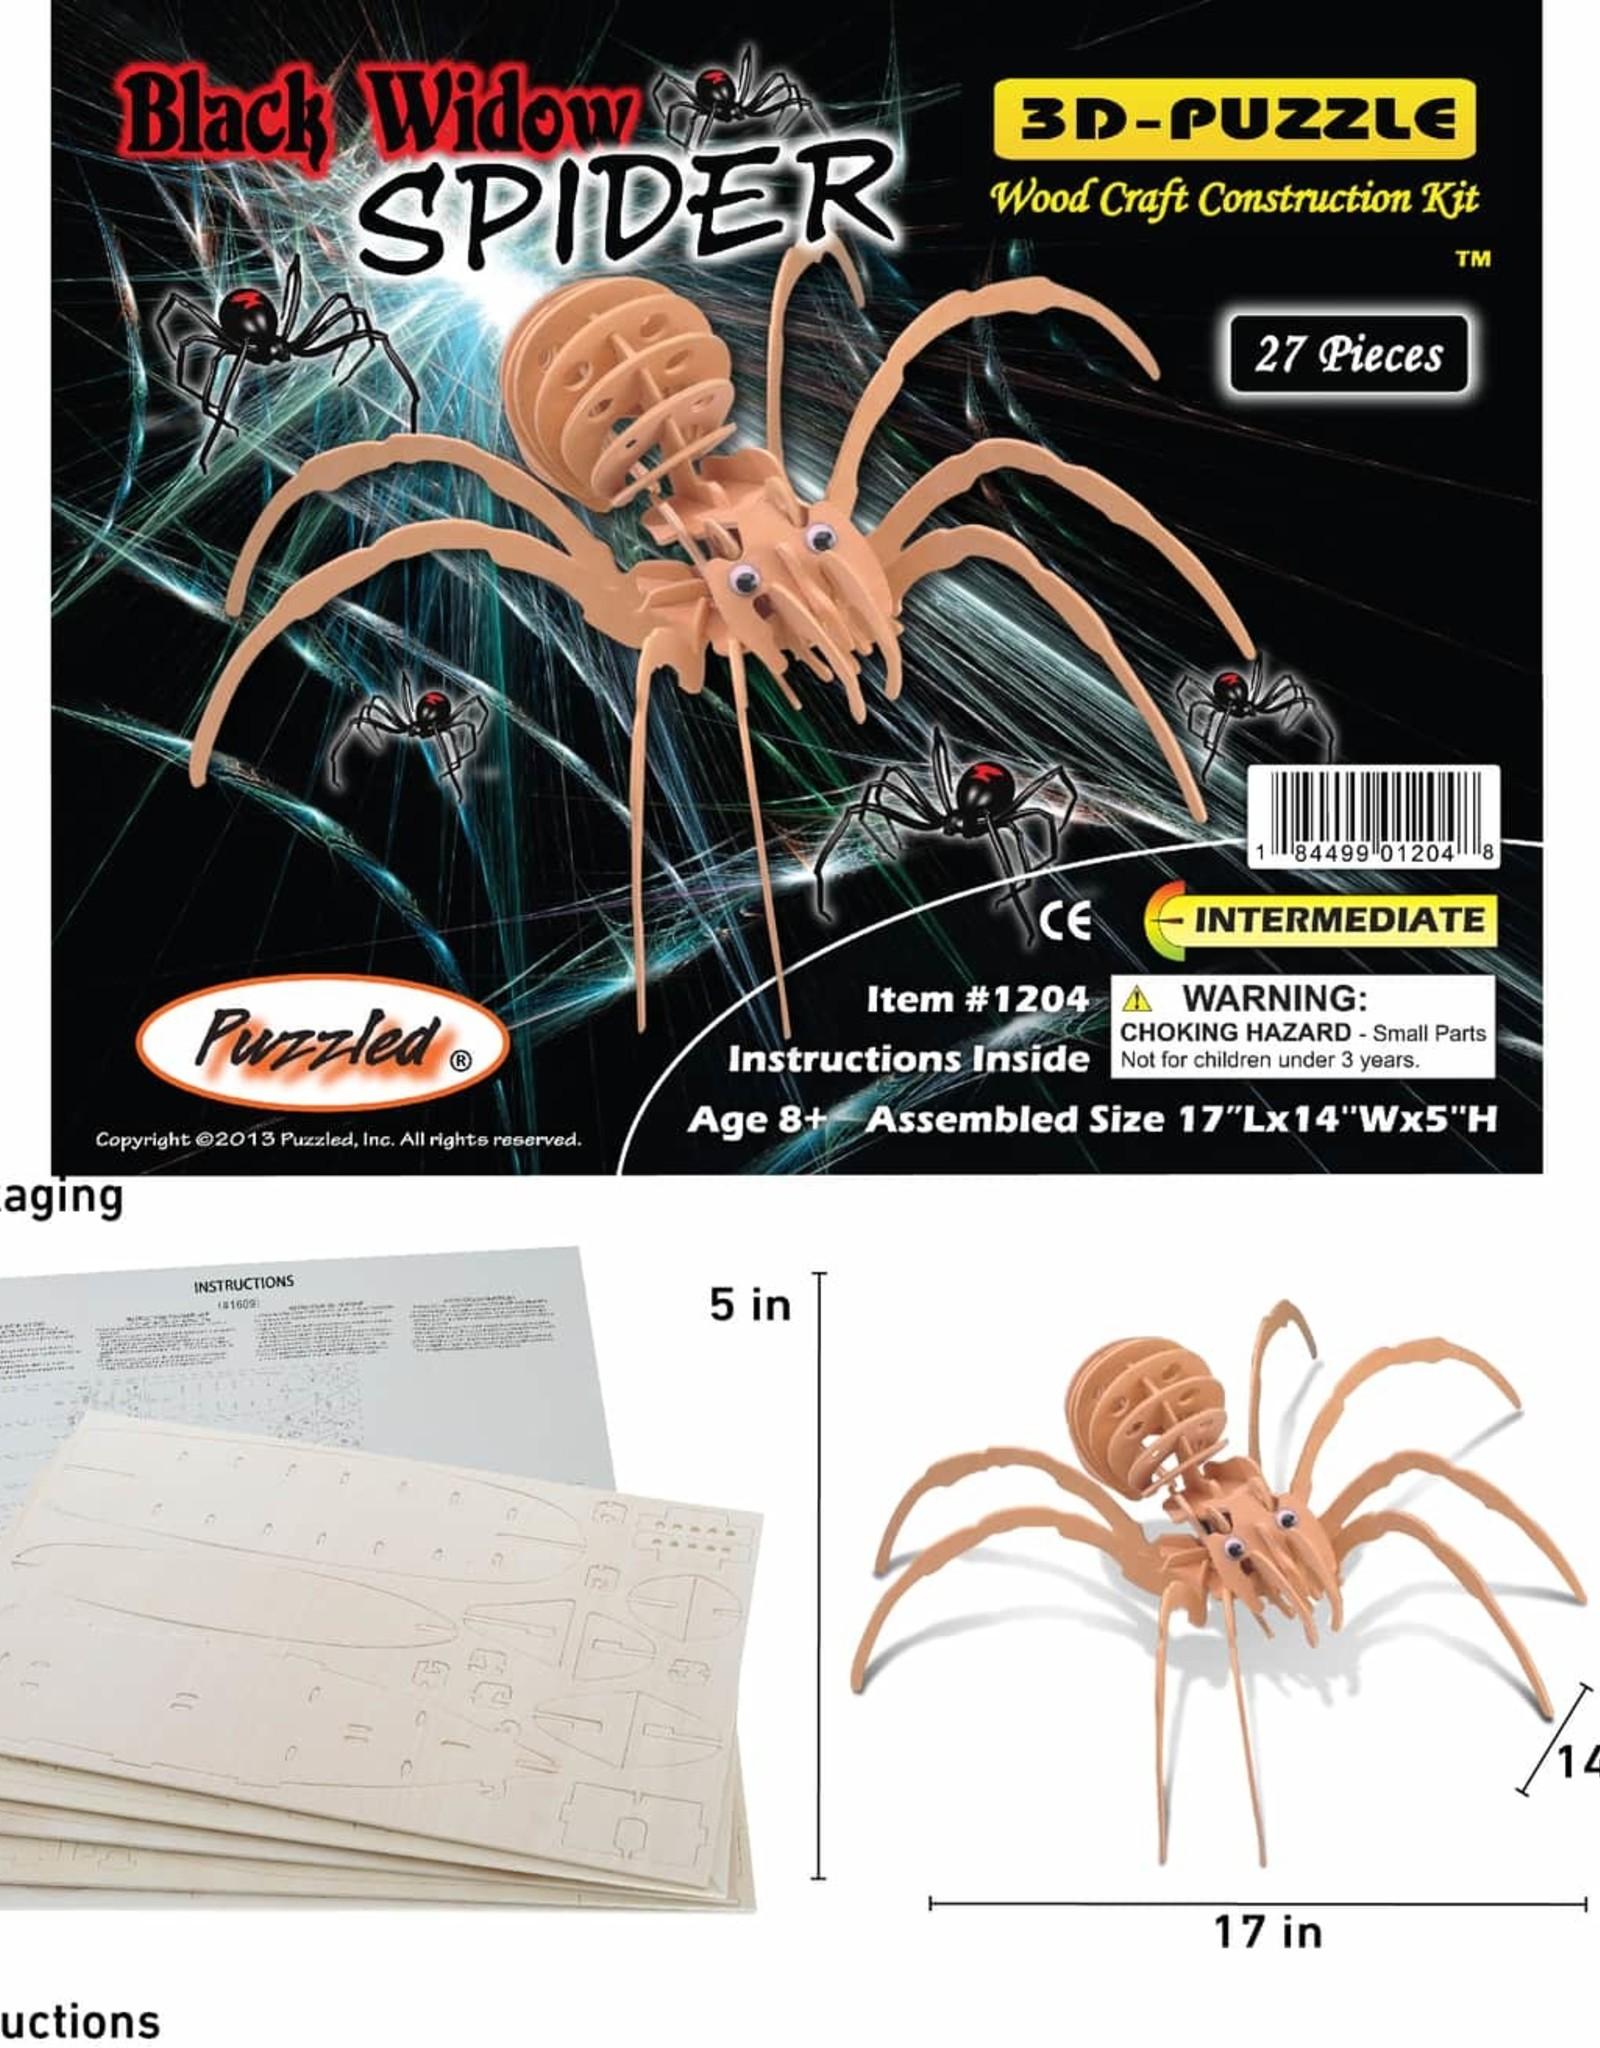 3D Puzzles Black Widow Spider